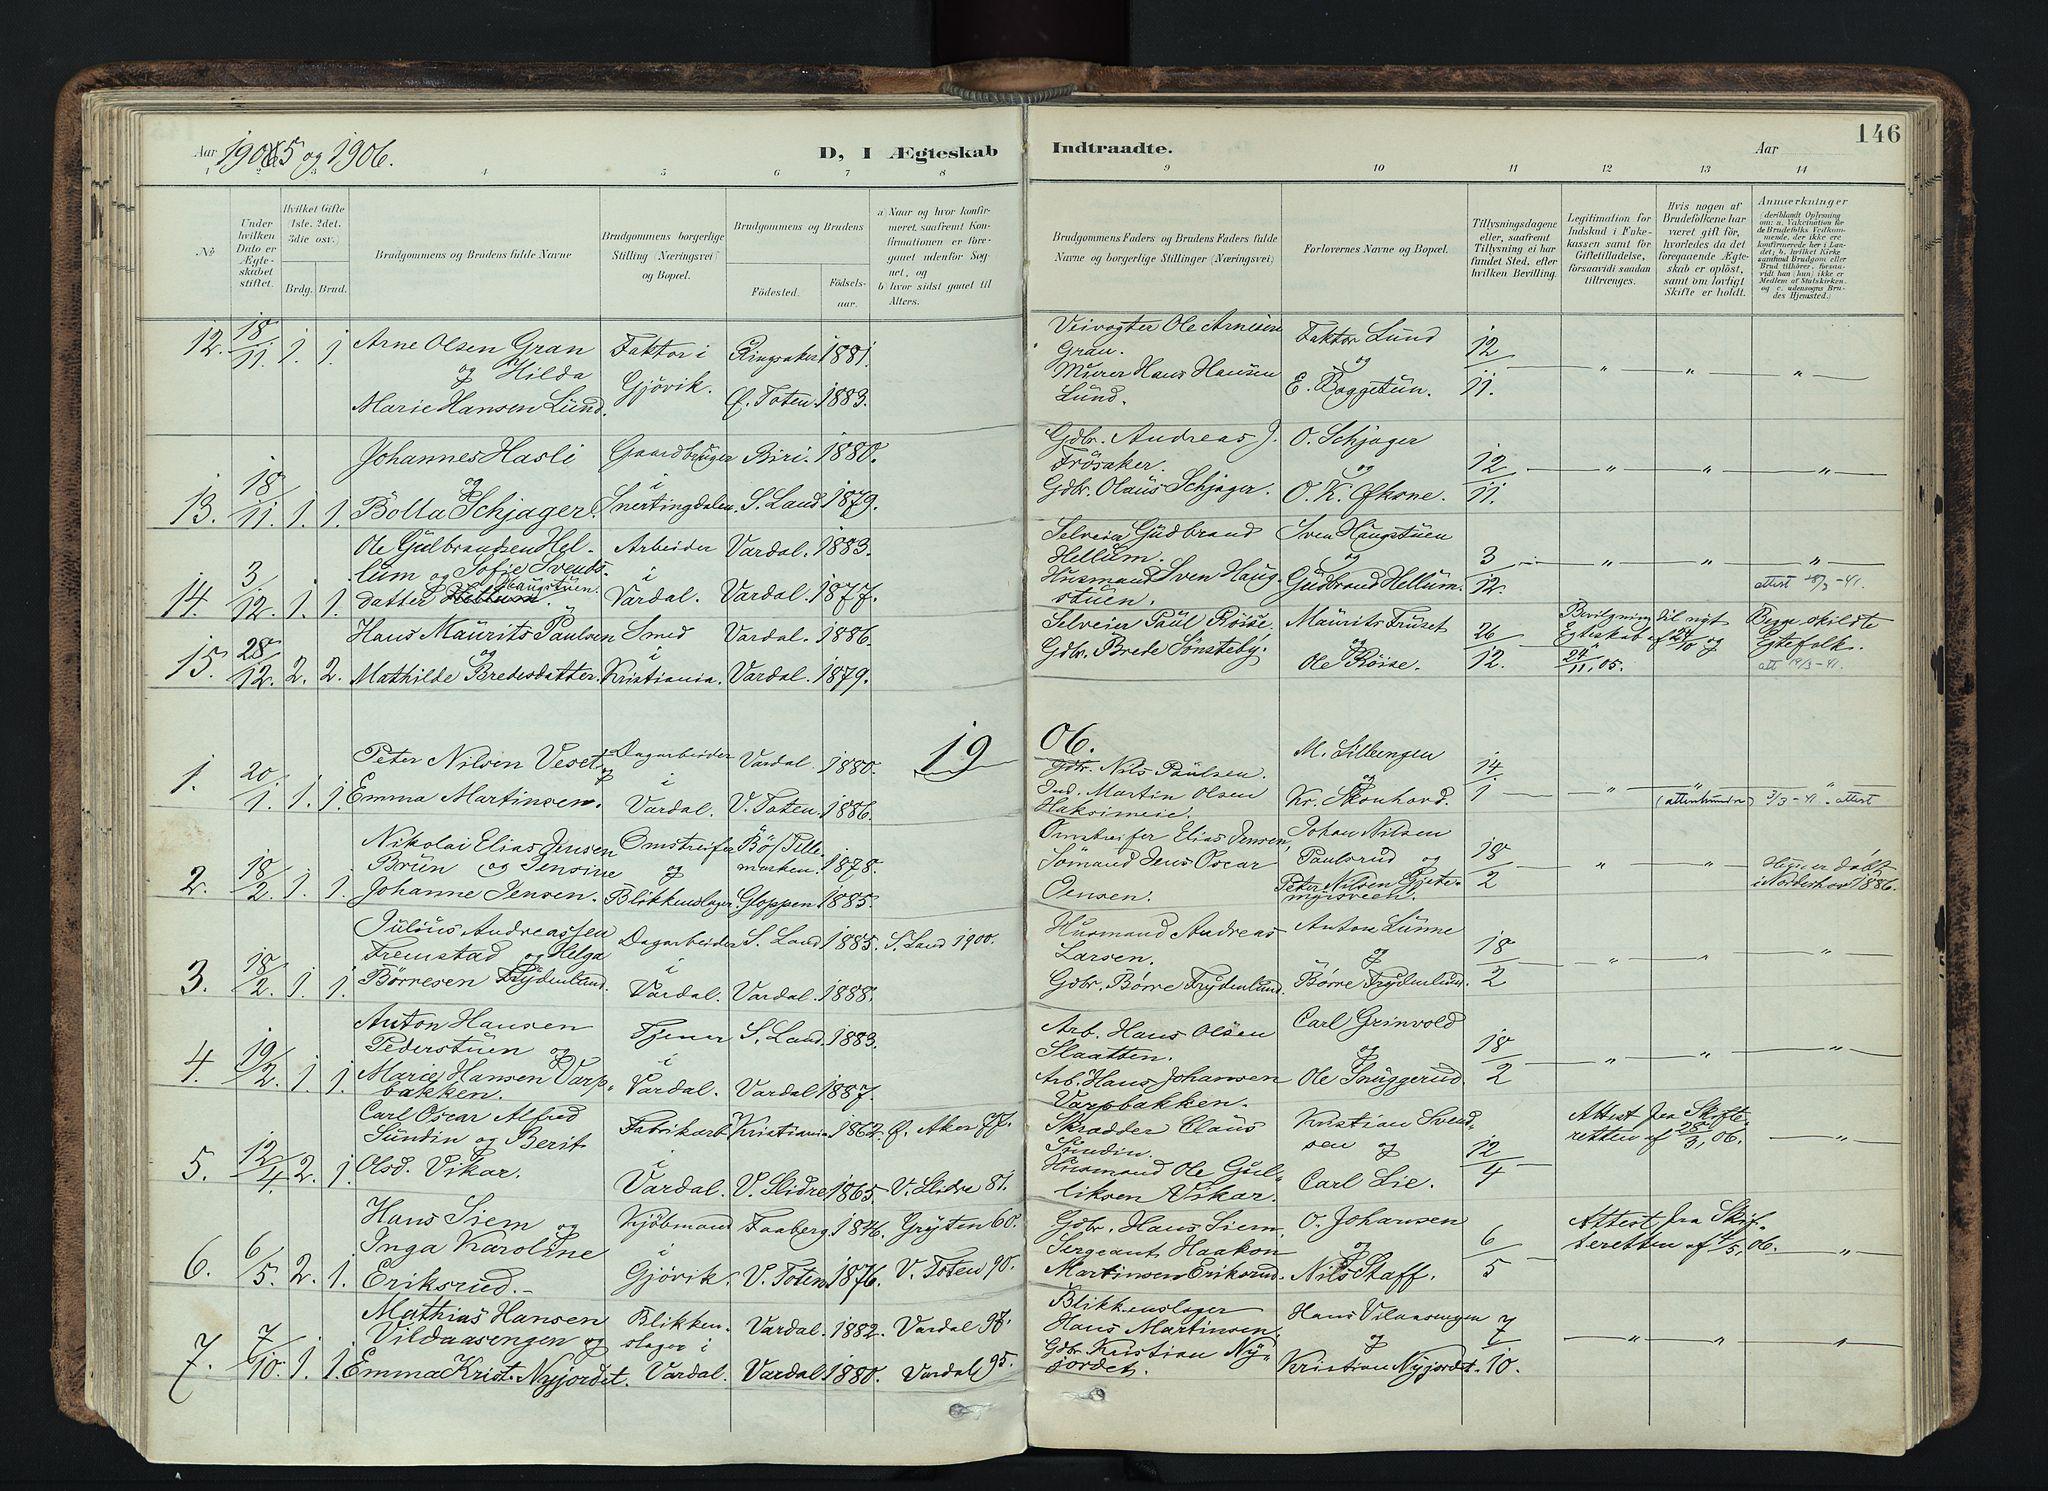 SAH, Vardal prestekontor, H/Ha/Haa/L0019: Ministerialbok nr. 19, 1893-1907, s. 146